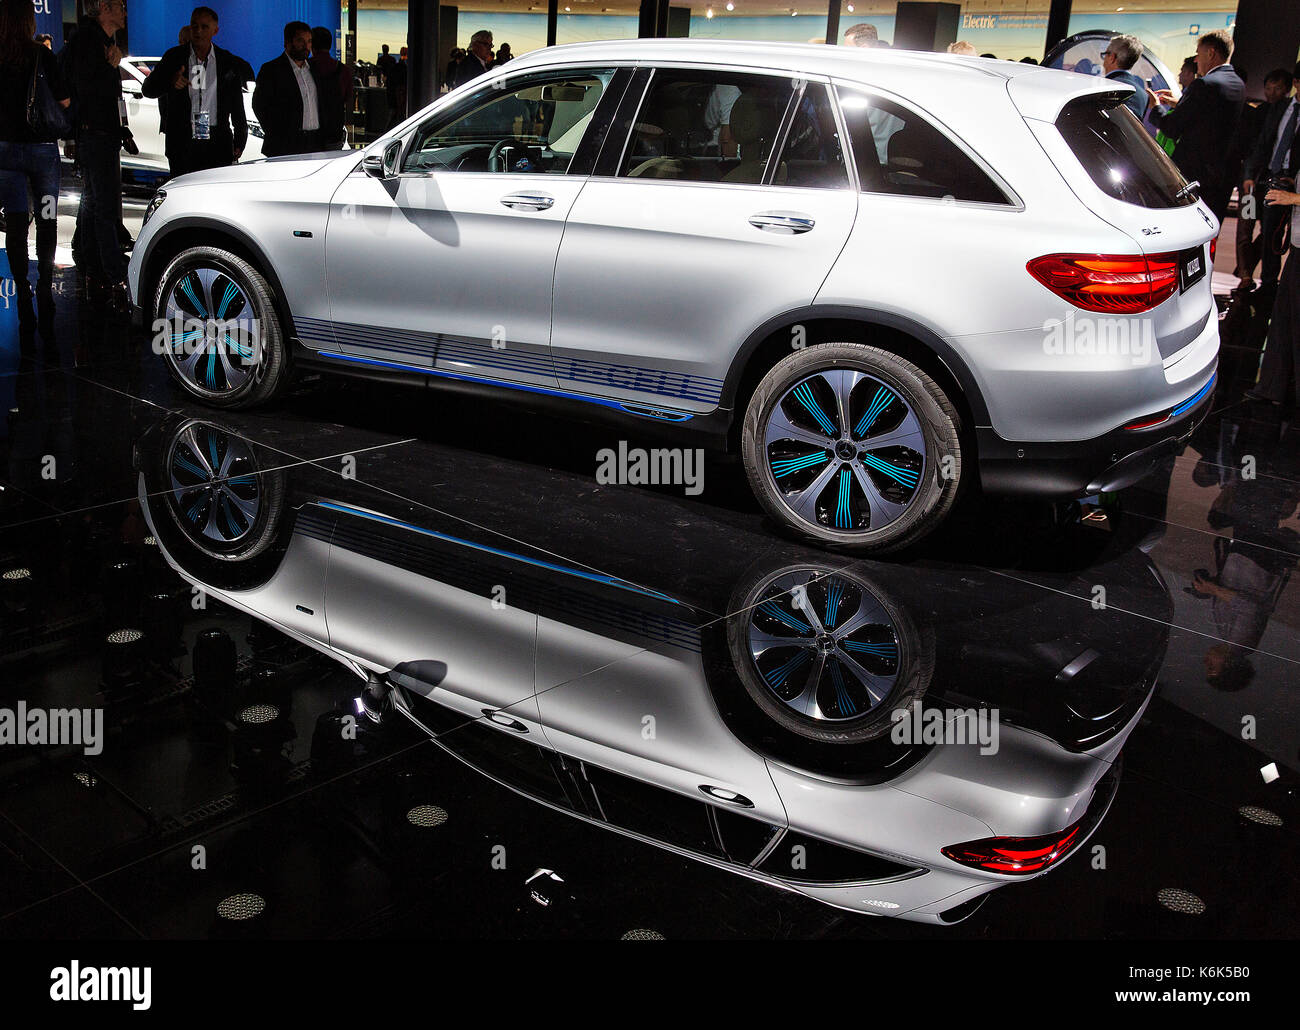 67th International Motorshow in Frankfurt,Mercedes-Benz GLC F-Cell - Stock Image